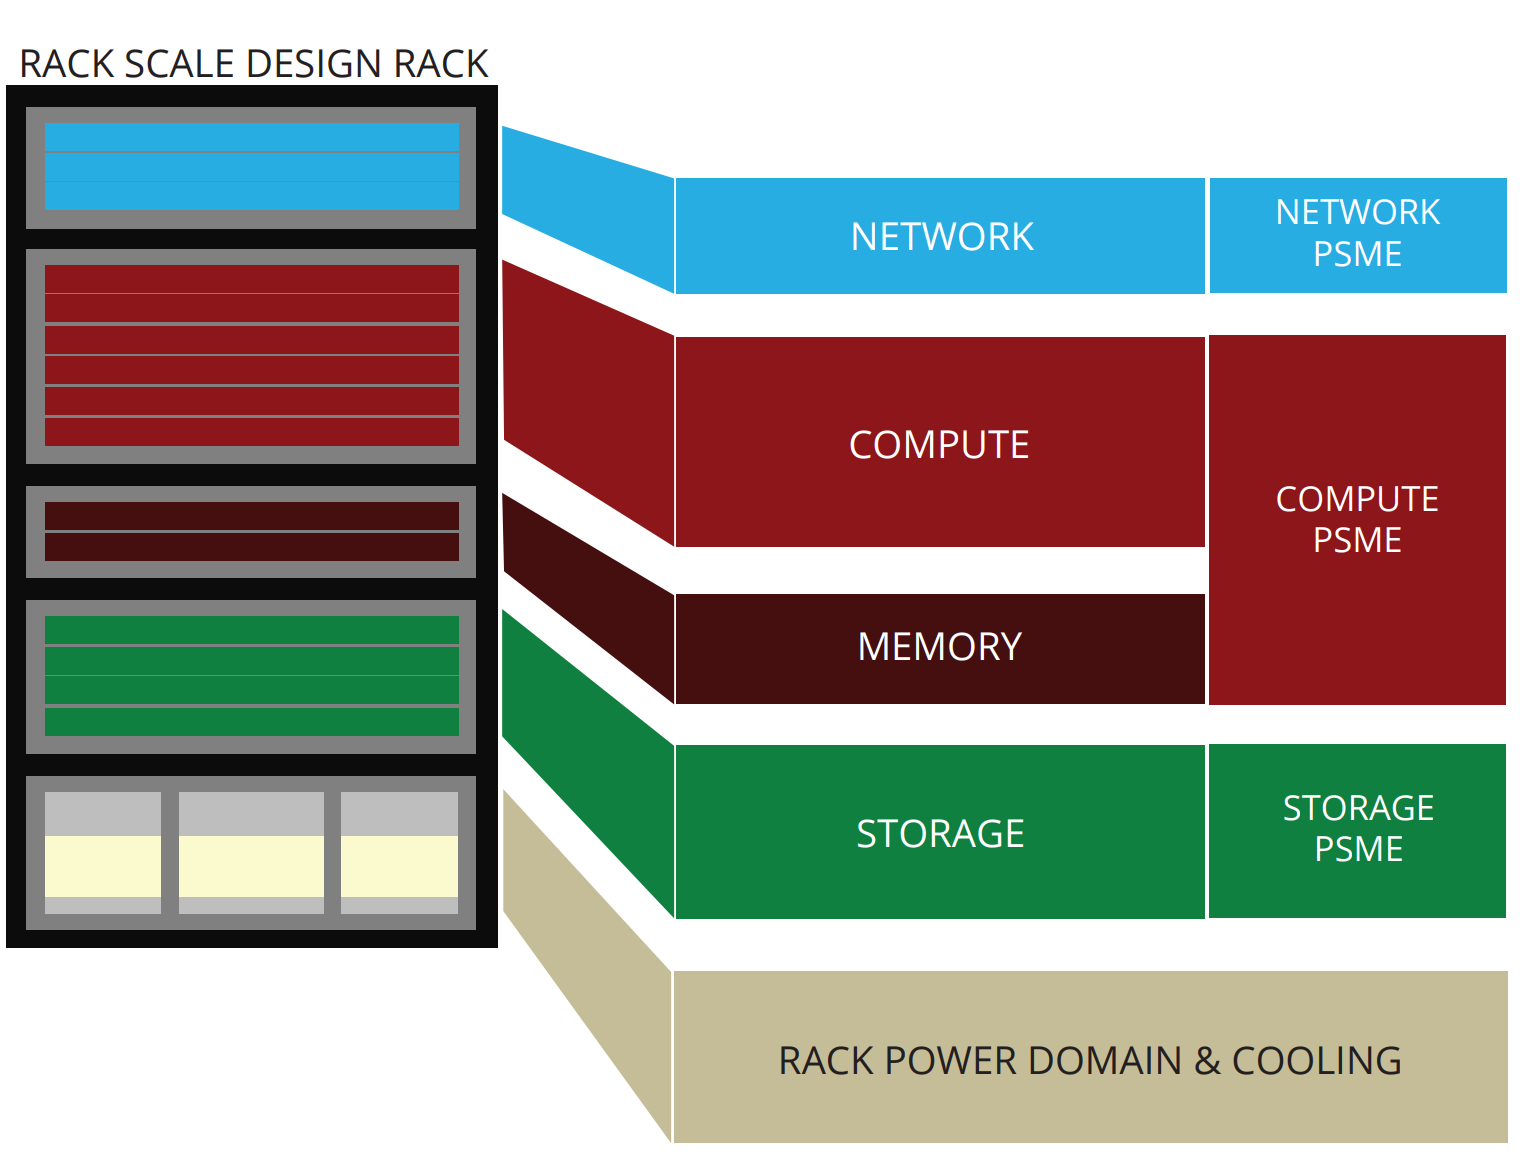 Redfish resources Intel RSD Rack Scale Design schema